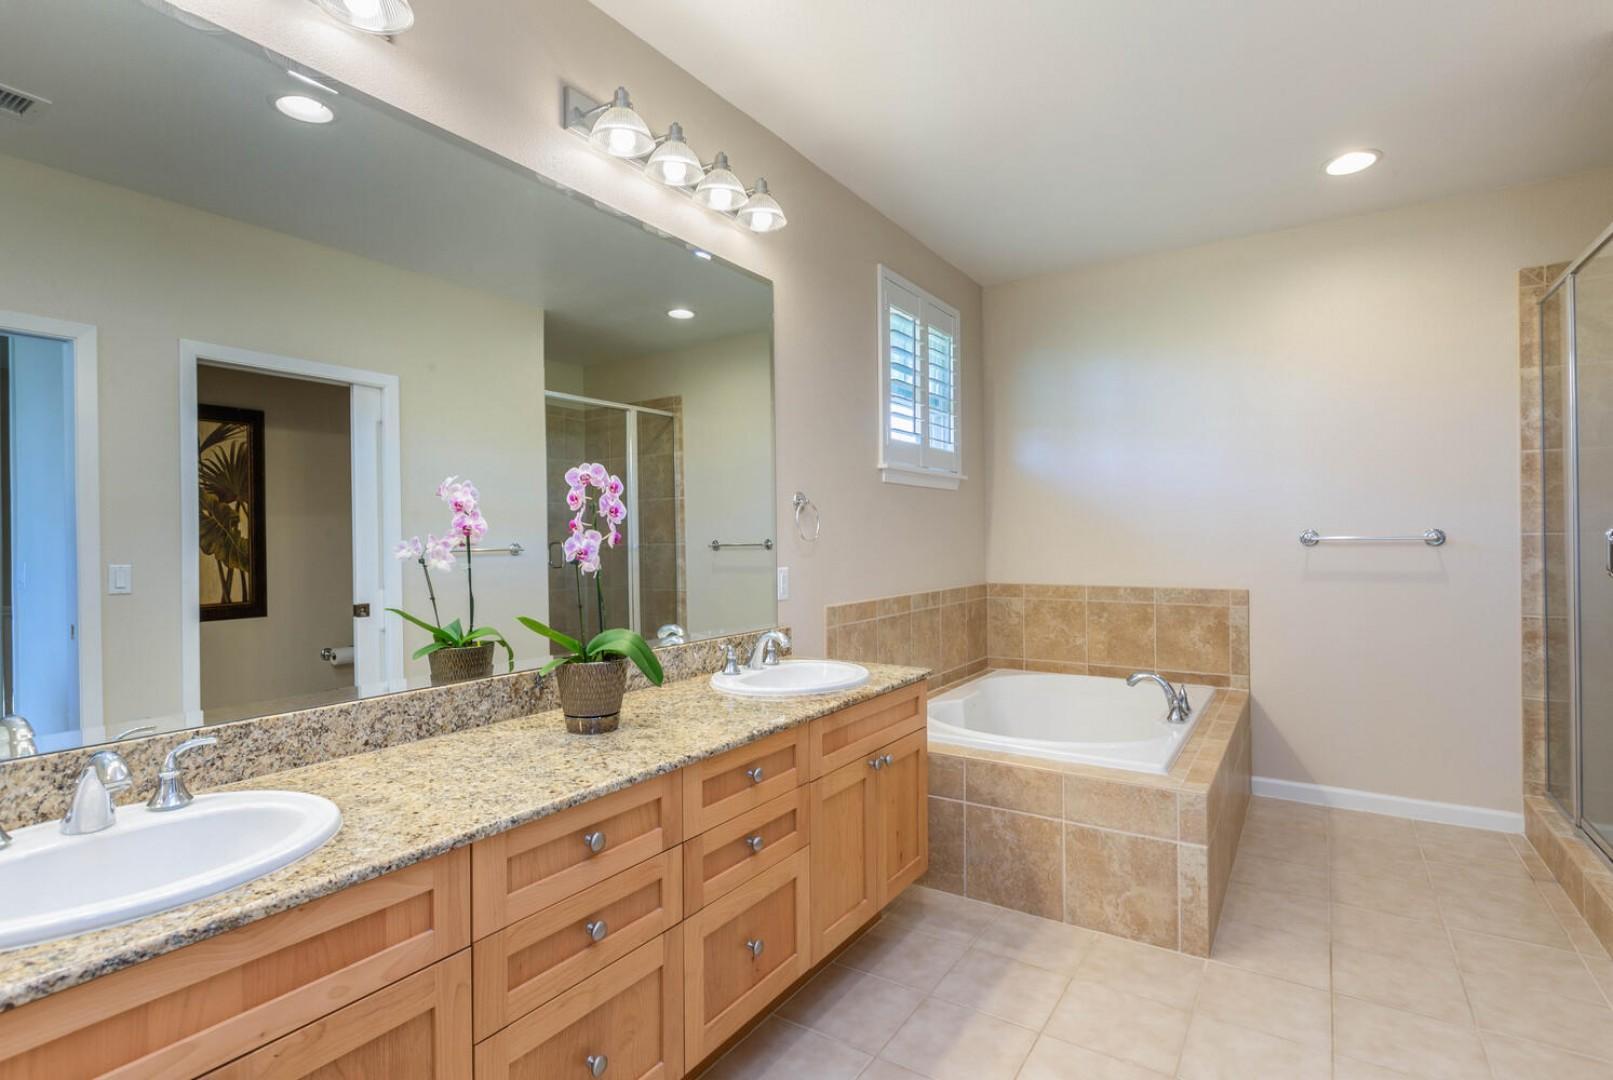 Ensuite Master Bathroom with double vanity sinks